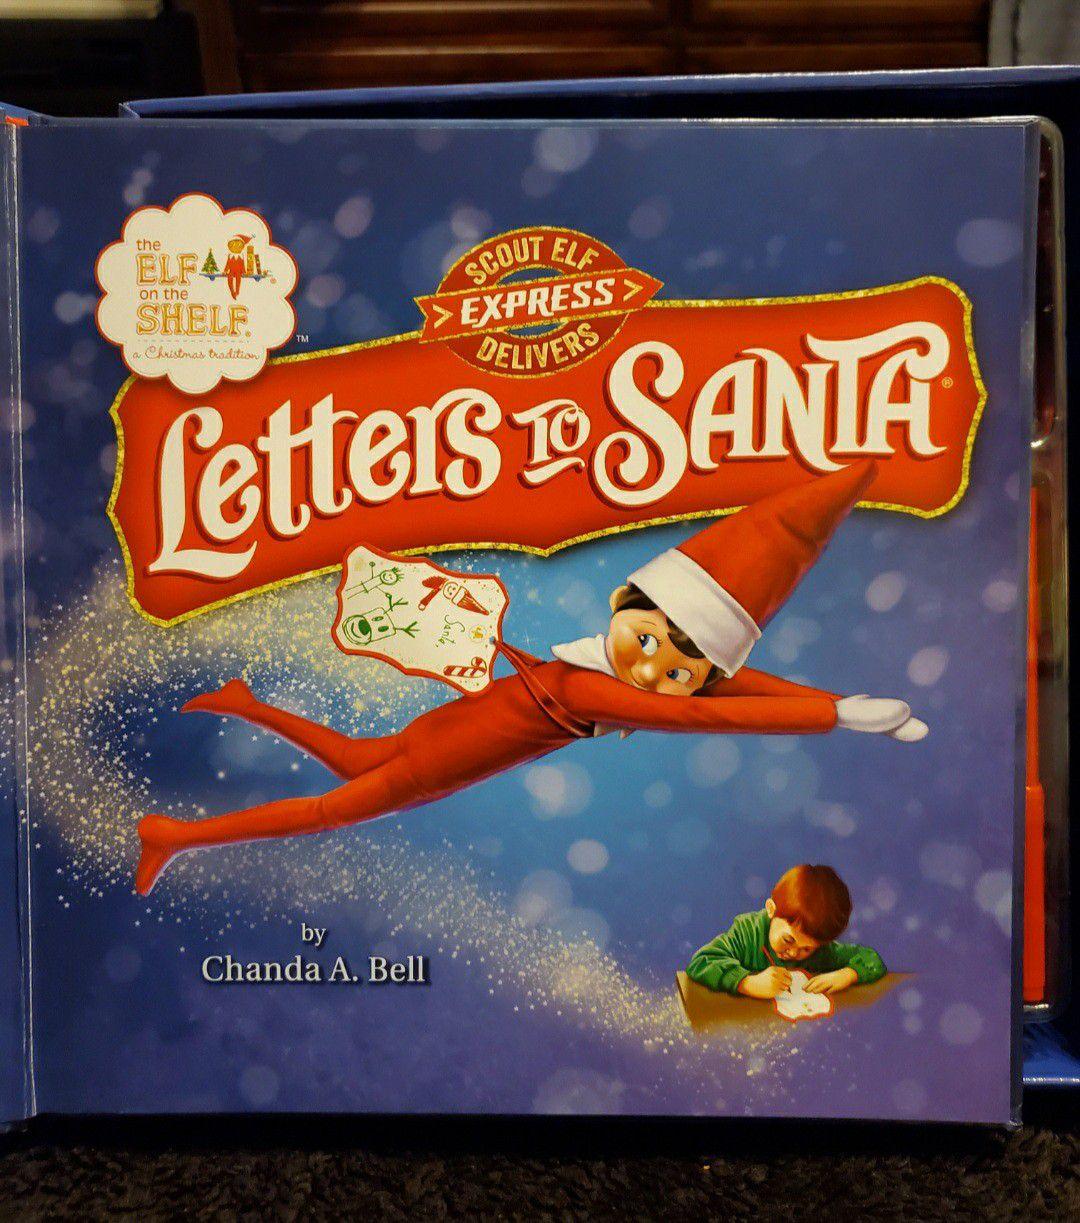 NEW Elf shelf letters to santa